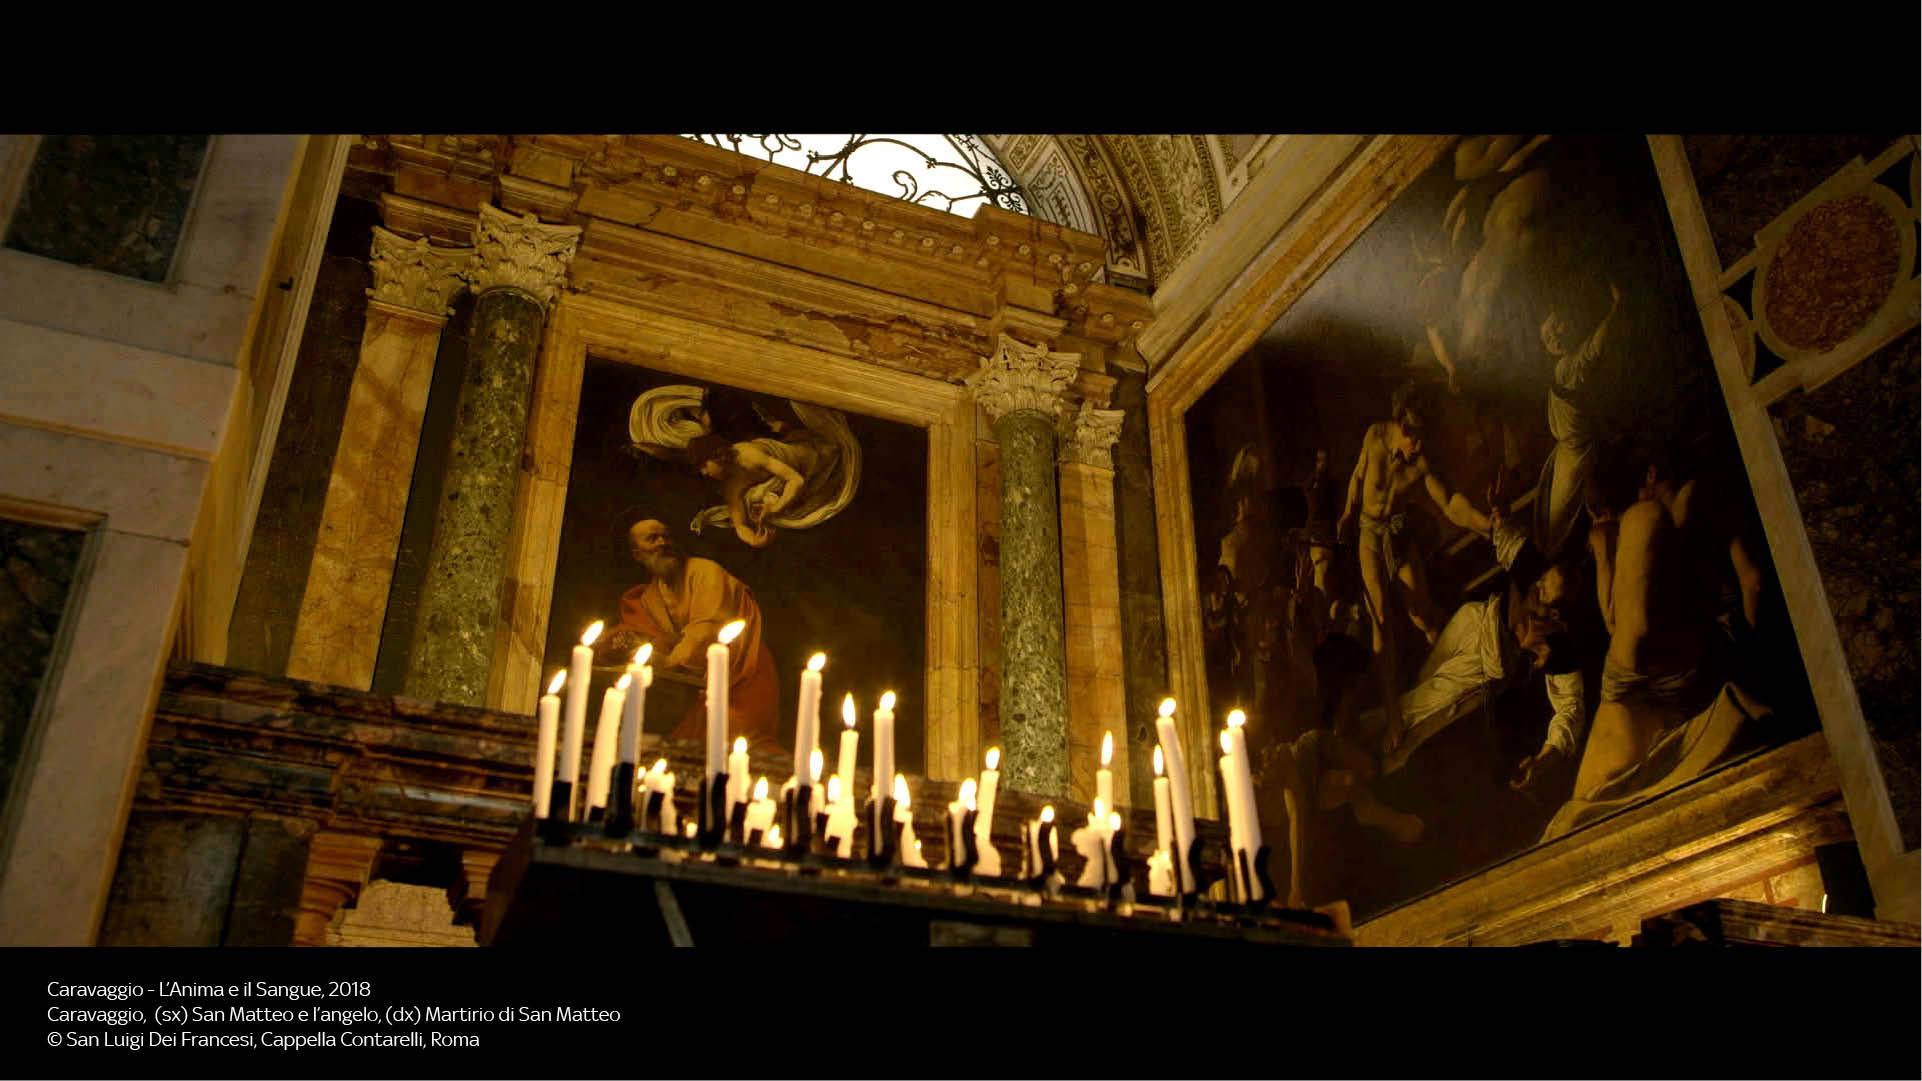 2.Contarelli Chapel San Luigi dei francesi (Rome).jpg